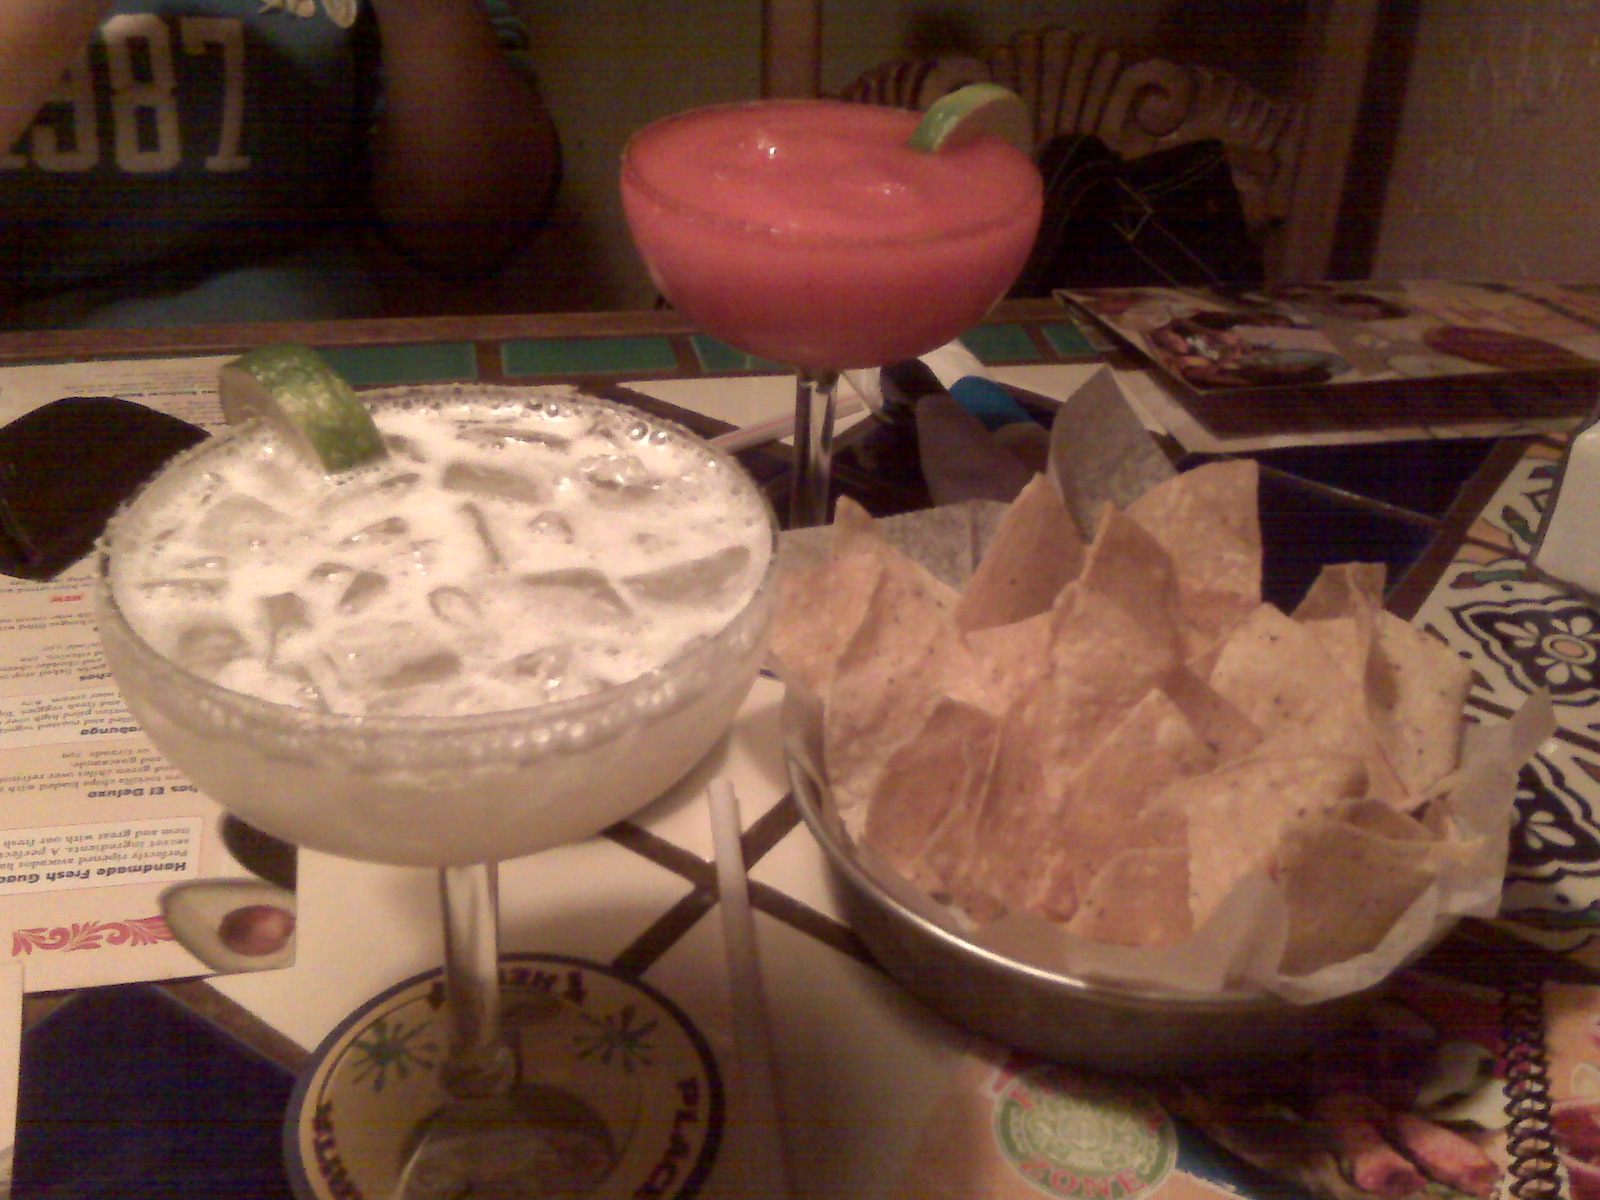 Margarita's Restaurant, Keene NH :: Margaritas! Strawberry for Samantha and Original for me!